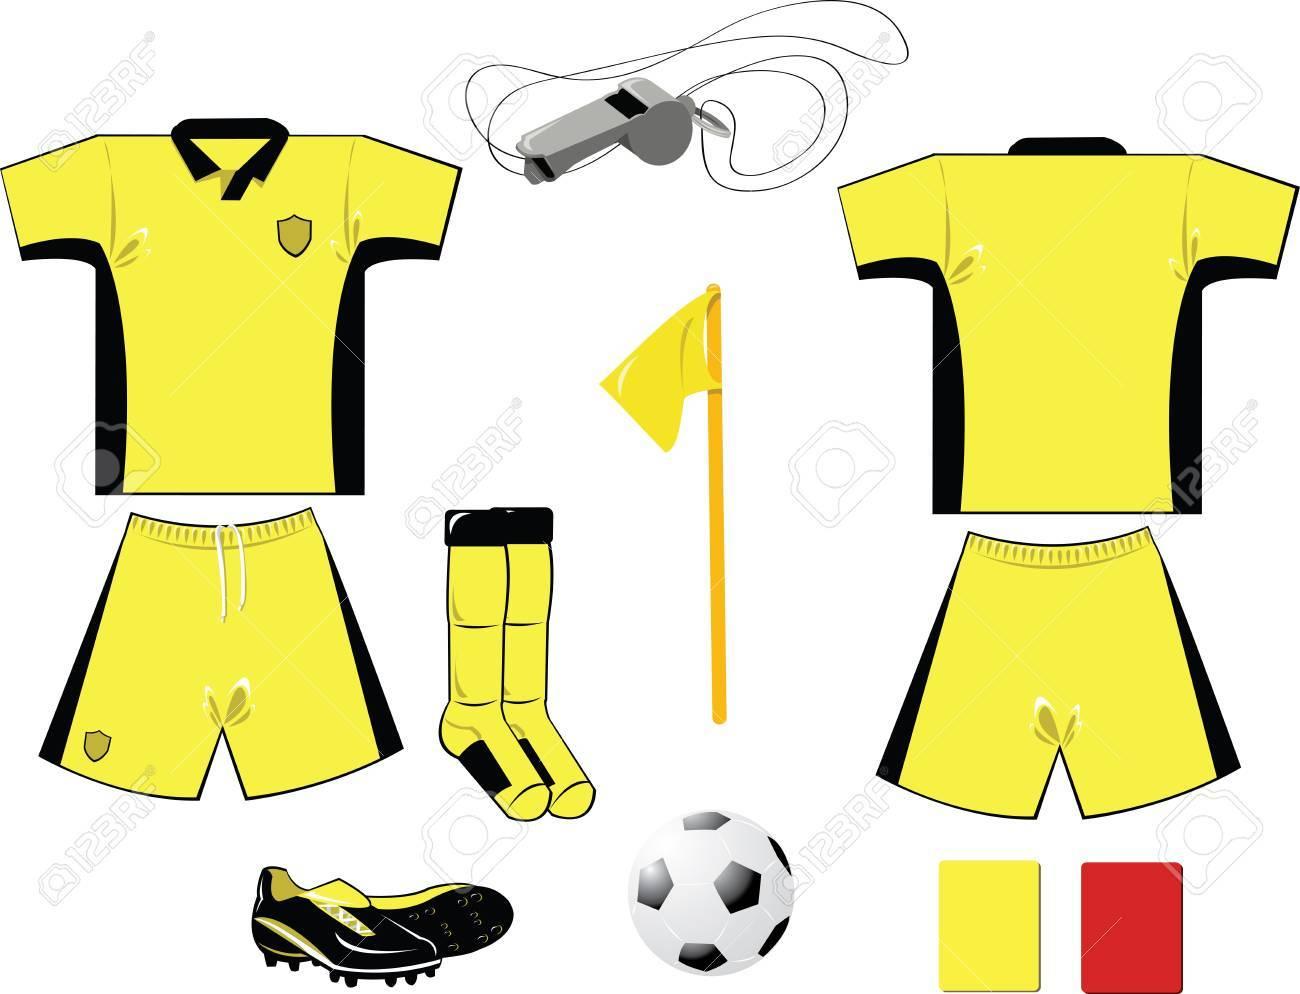 Yellow Arbiter Equipment Stock Vector - 22096137